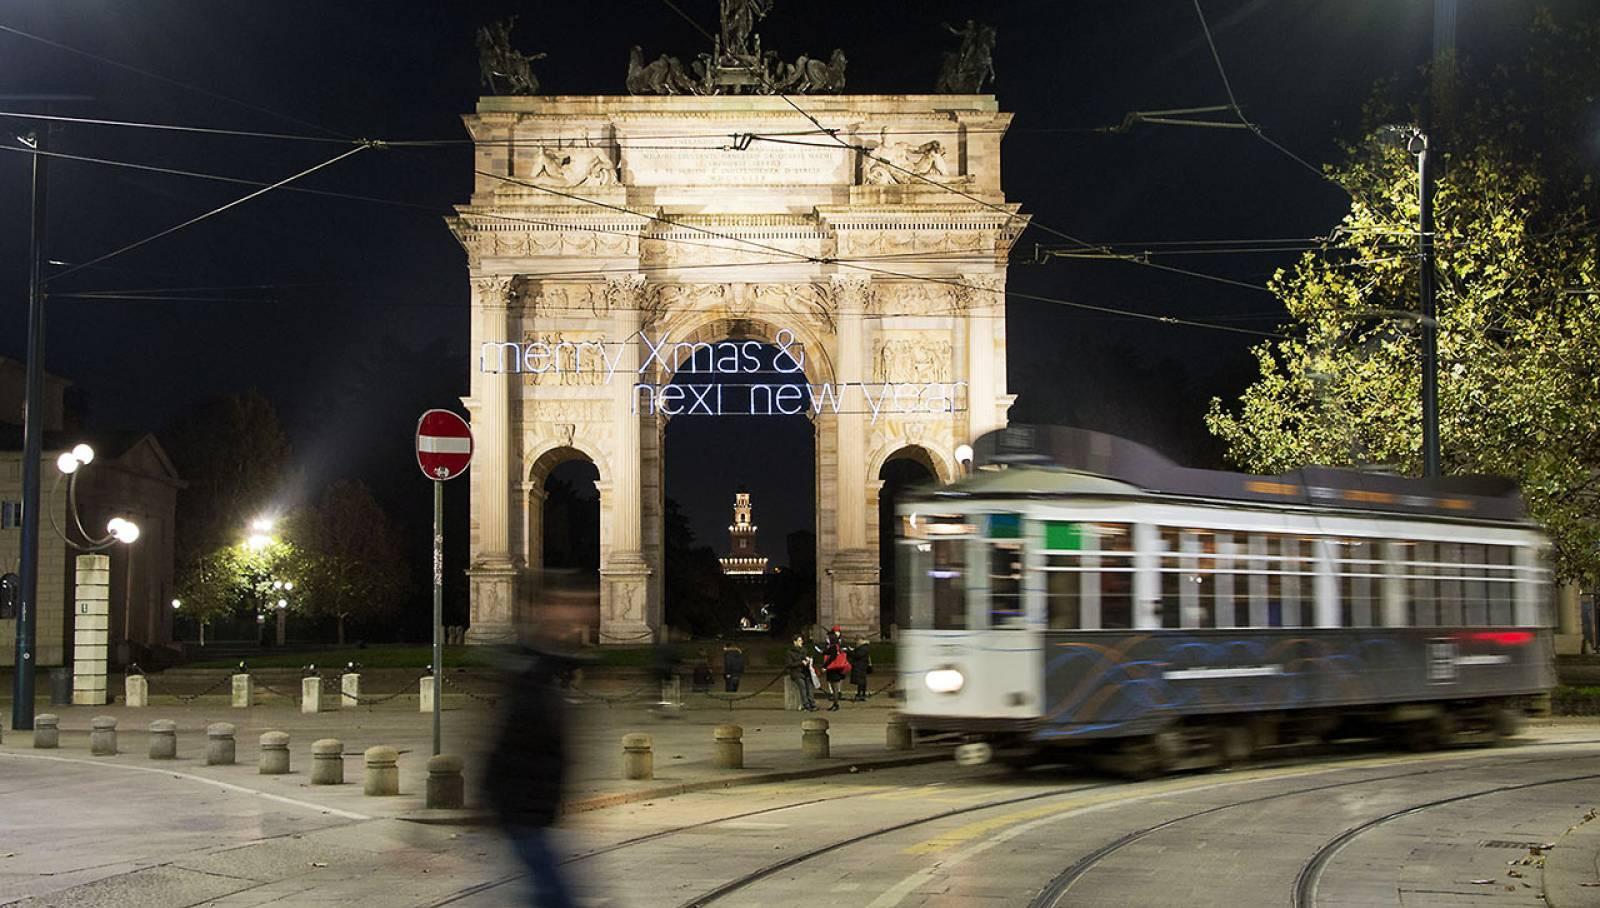 Christmas lights in Milan for Nexi